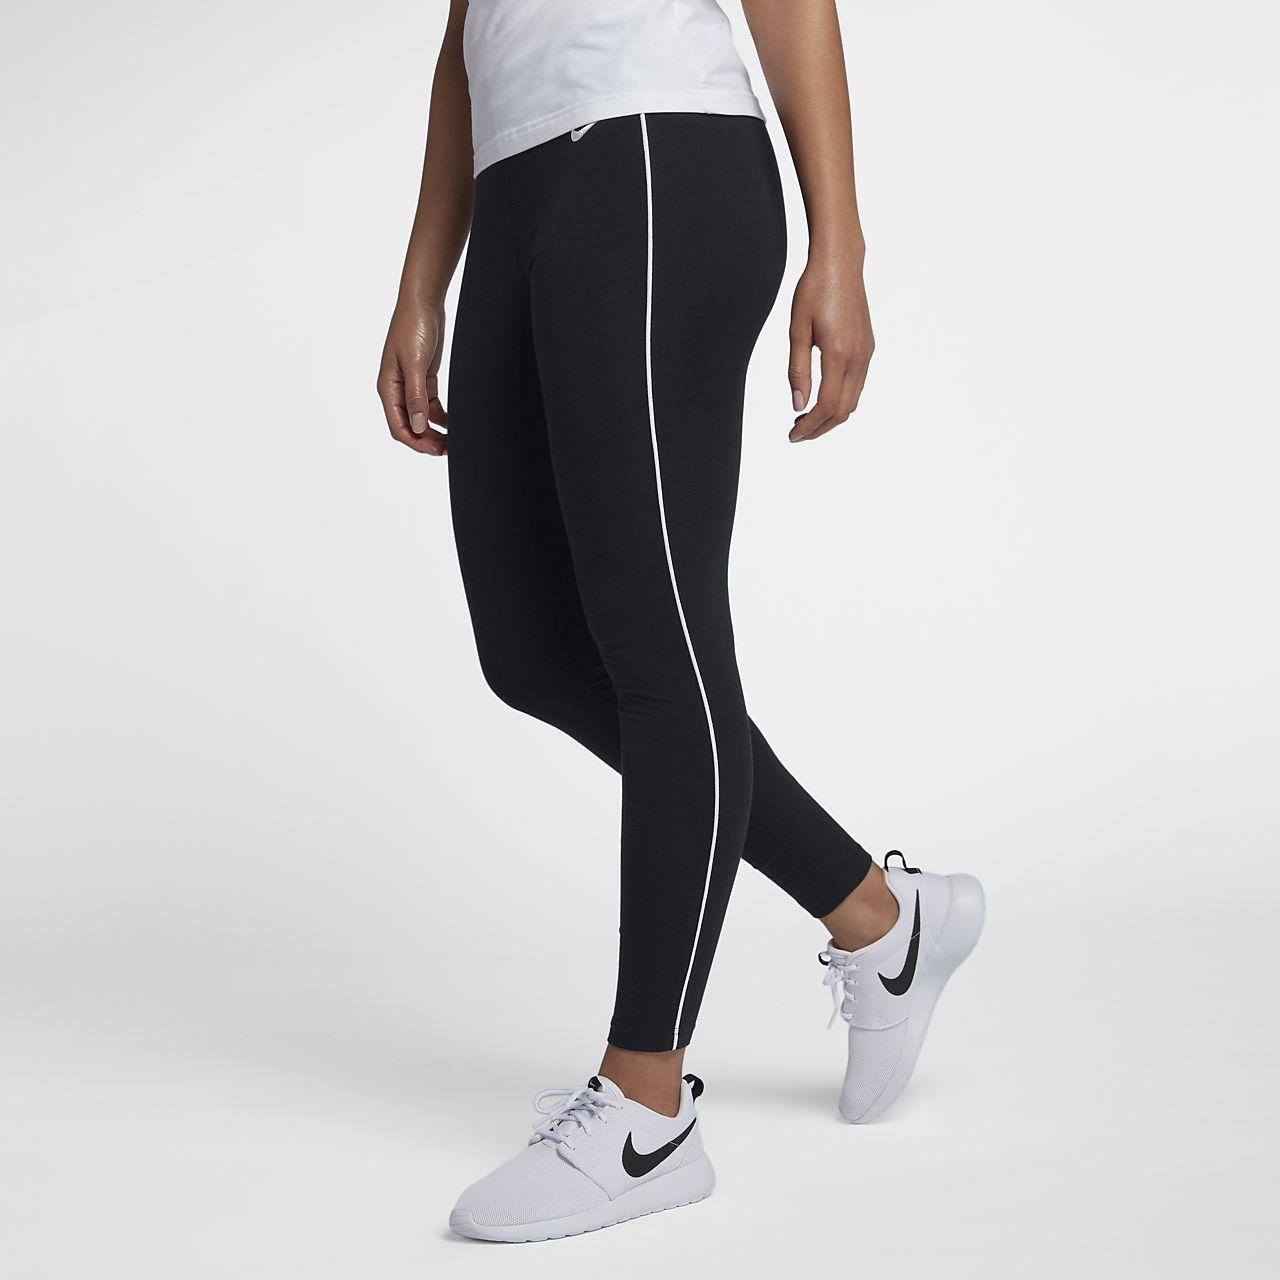 new concept 06910 a32d2 Low Resolution Leggings Nike Sportswear för kvinnor Leggings Nike  Sportswear för kvinnor